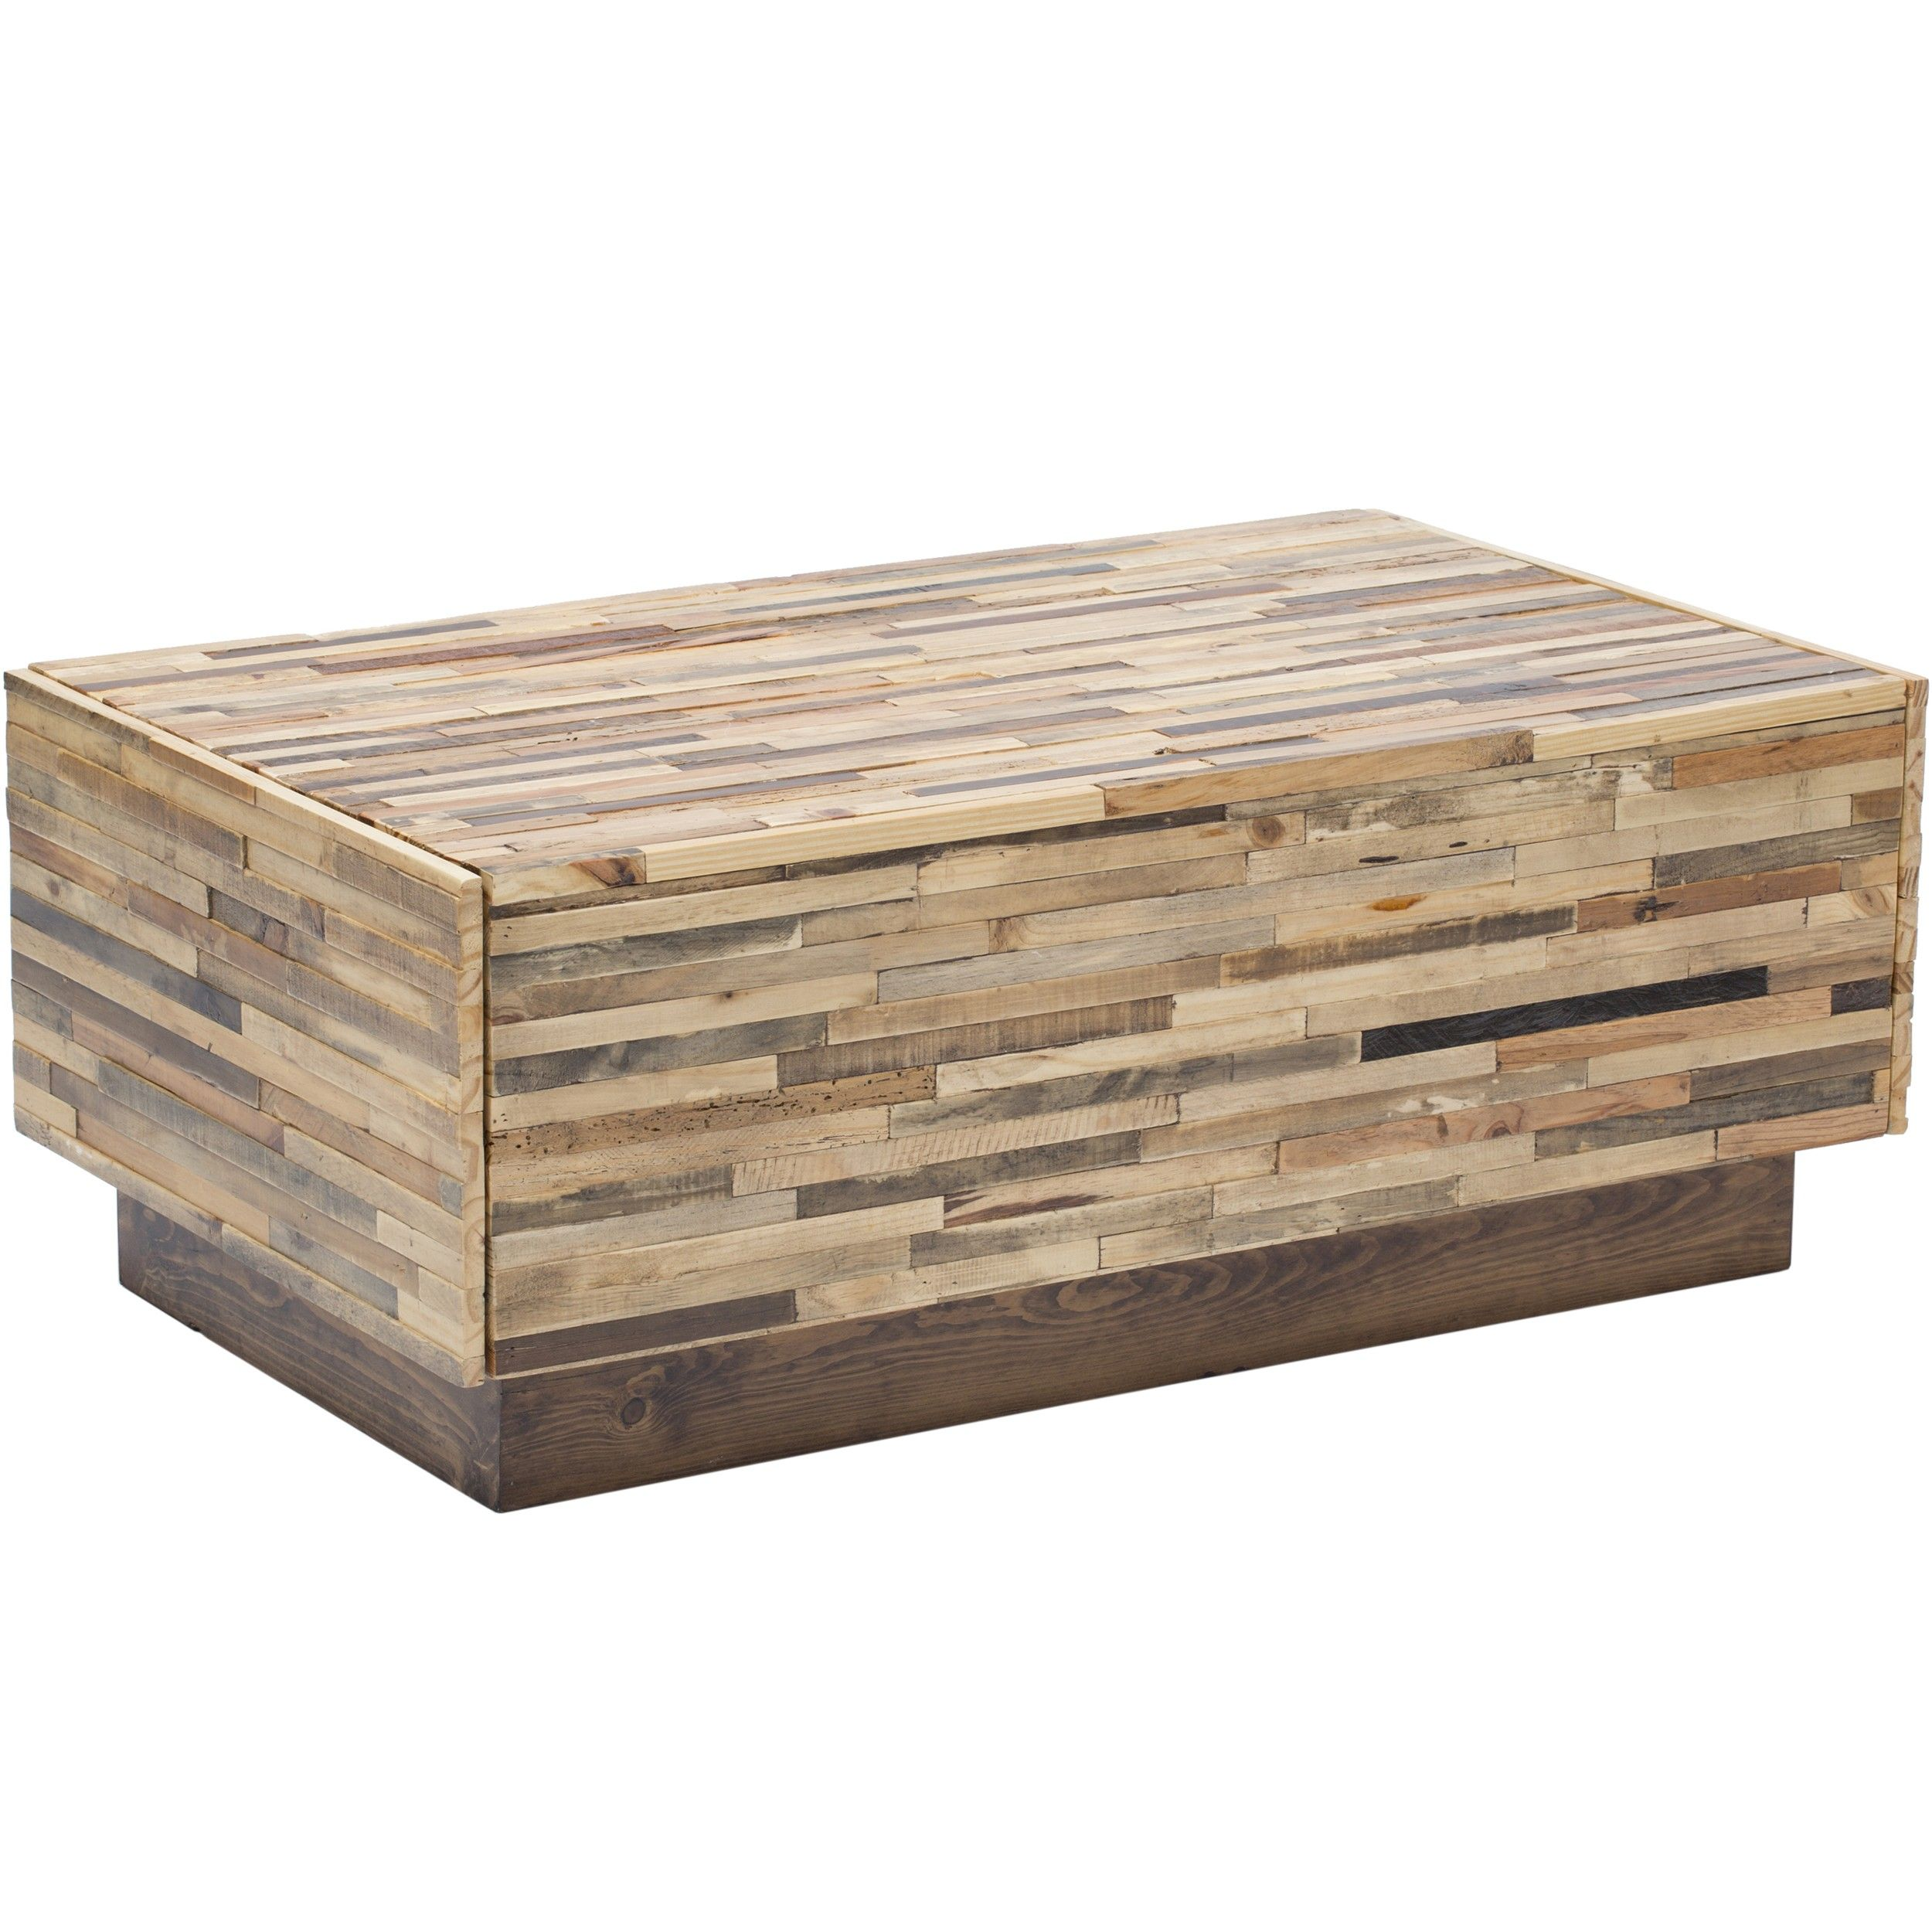 Rustic Pine Wood Coffee Table: Caledonia Reclaimed Pine Wood 2 Drawer Coffee Table